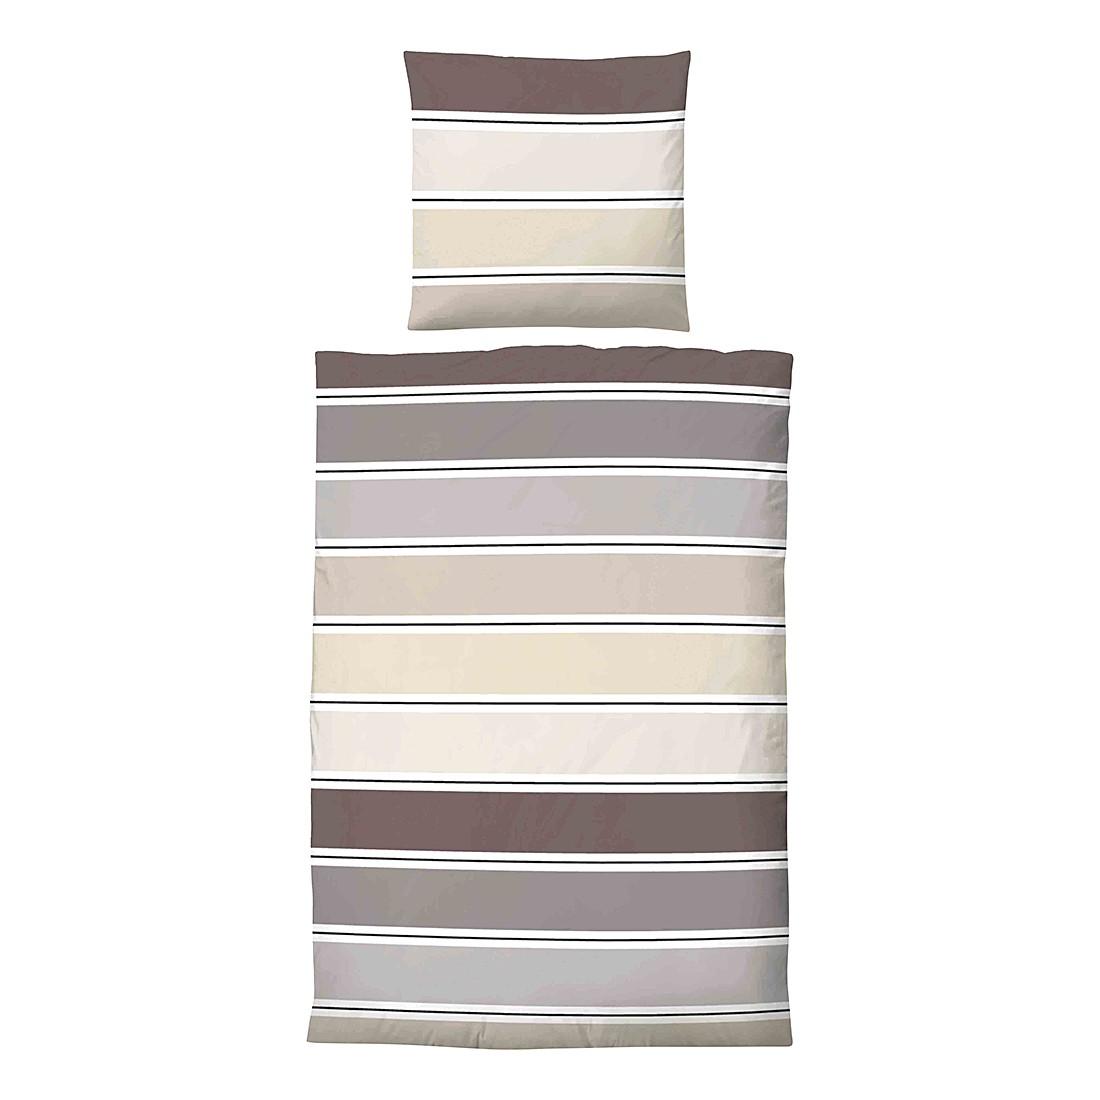 Home 24 - Parure de lit en satin maco jana - marron - 135 x 200 cm + coussin 80 x 80 cm, biberna